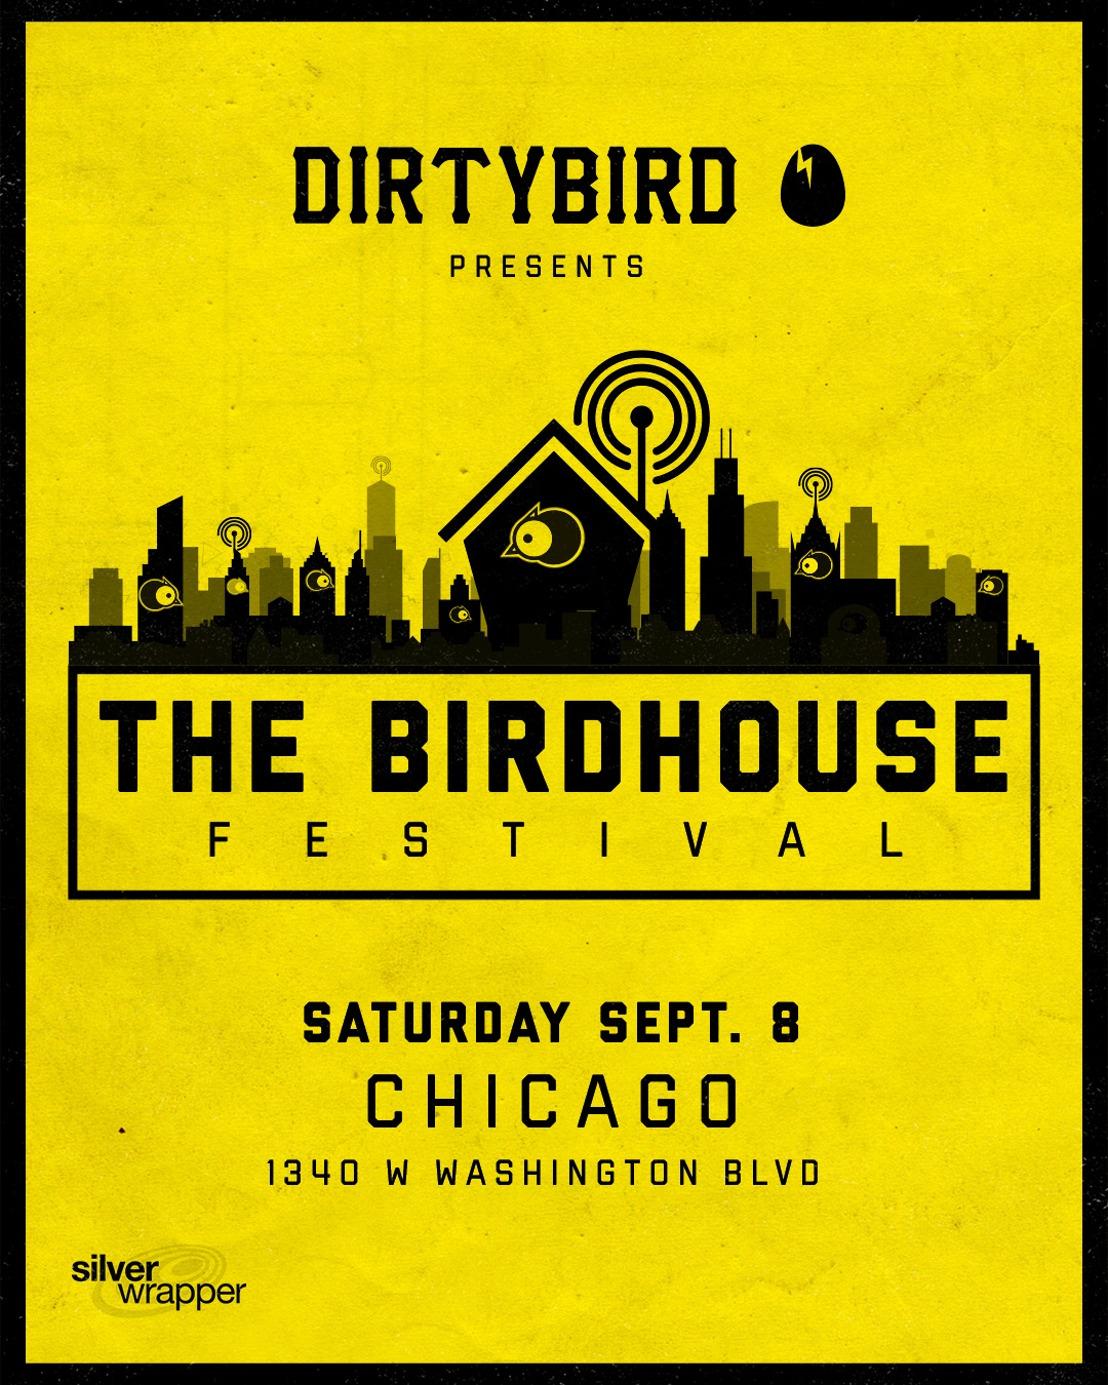 Dirtybird Presents: The Birdhouse Festival